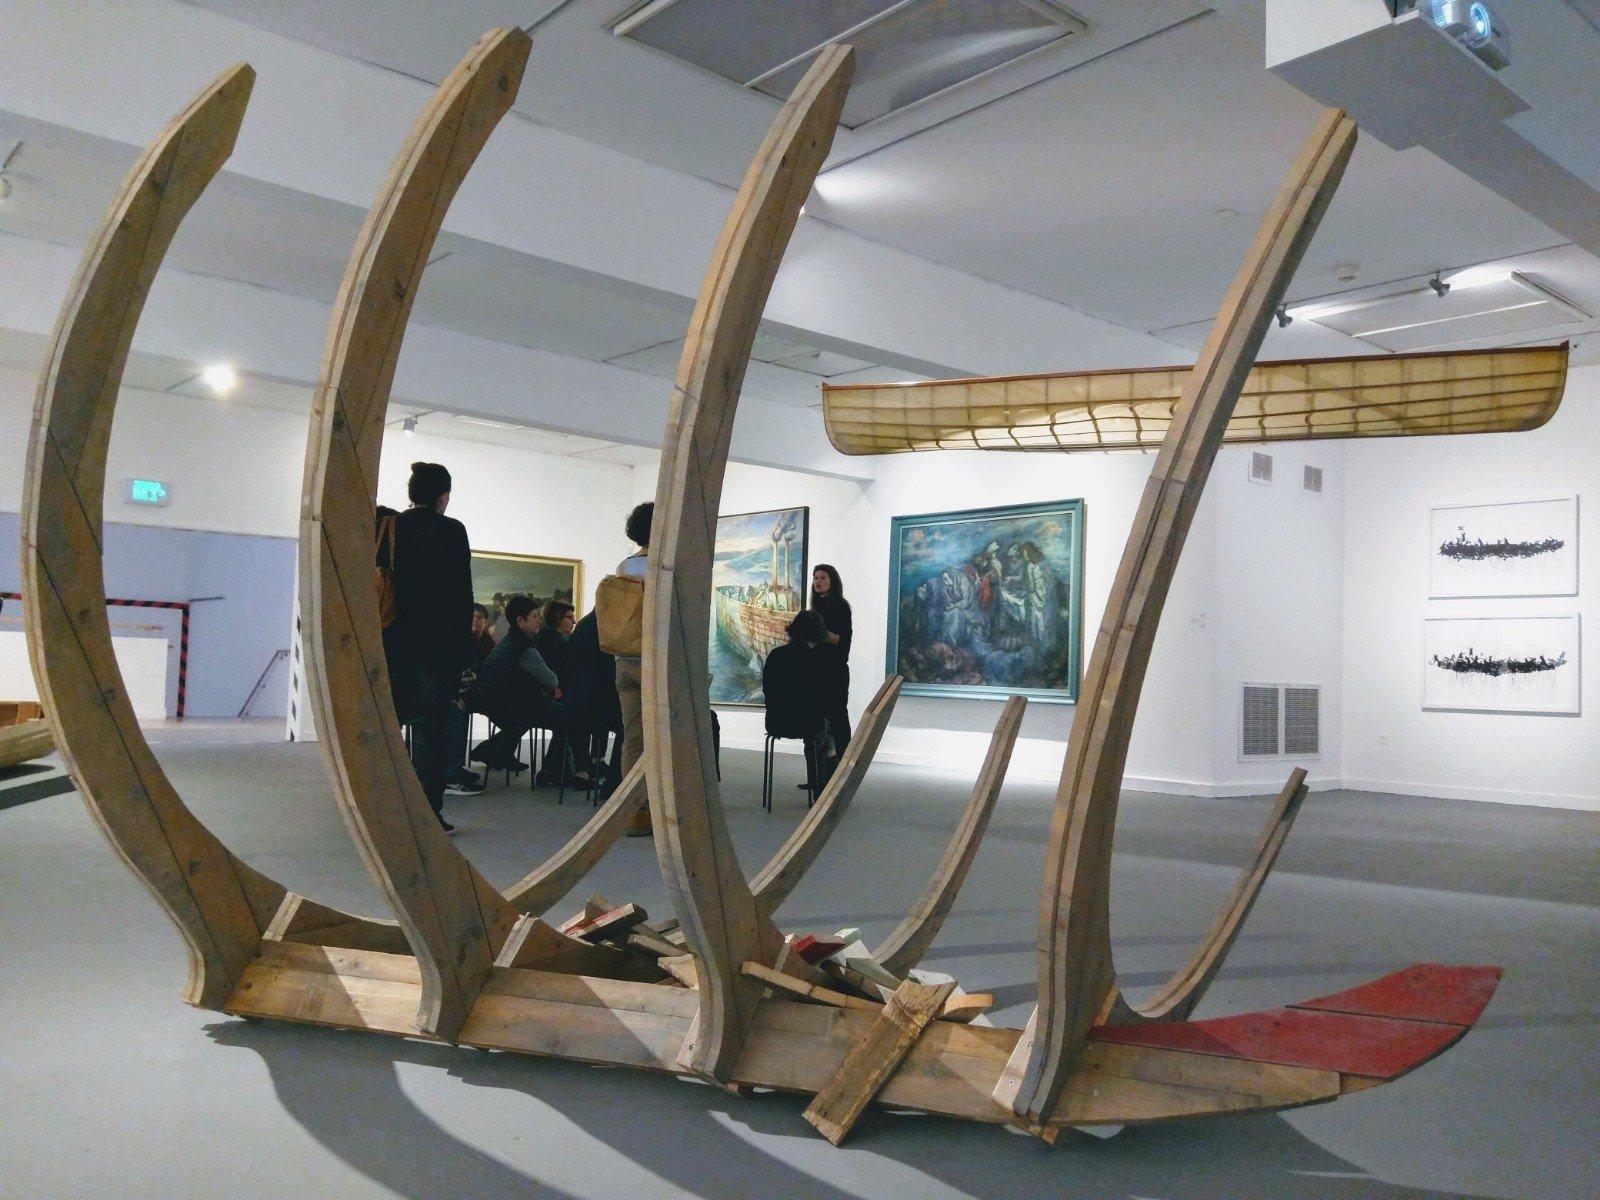 Dangerous Art, Cluster of Exhibitions in the Haifa Museum of Art, November 11 2017- April 14 2018, Haifa, Israel